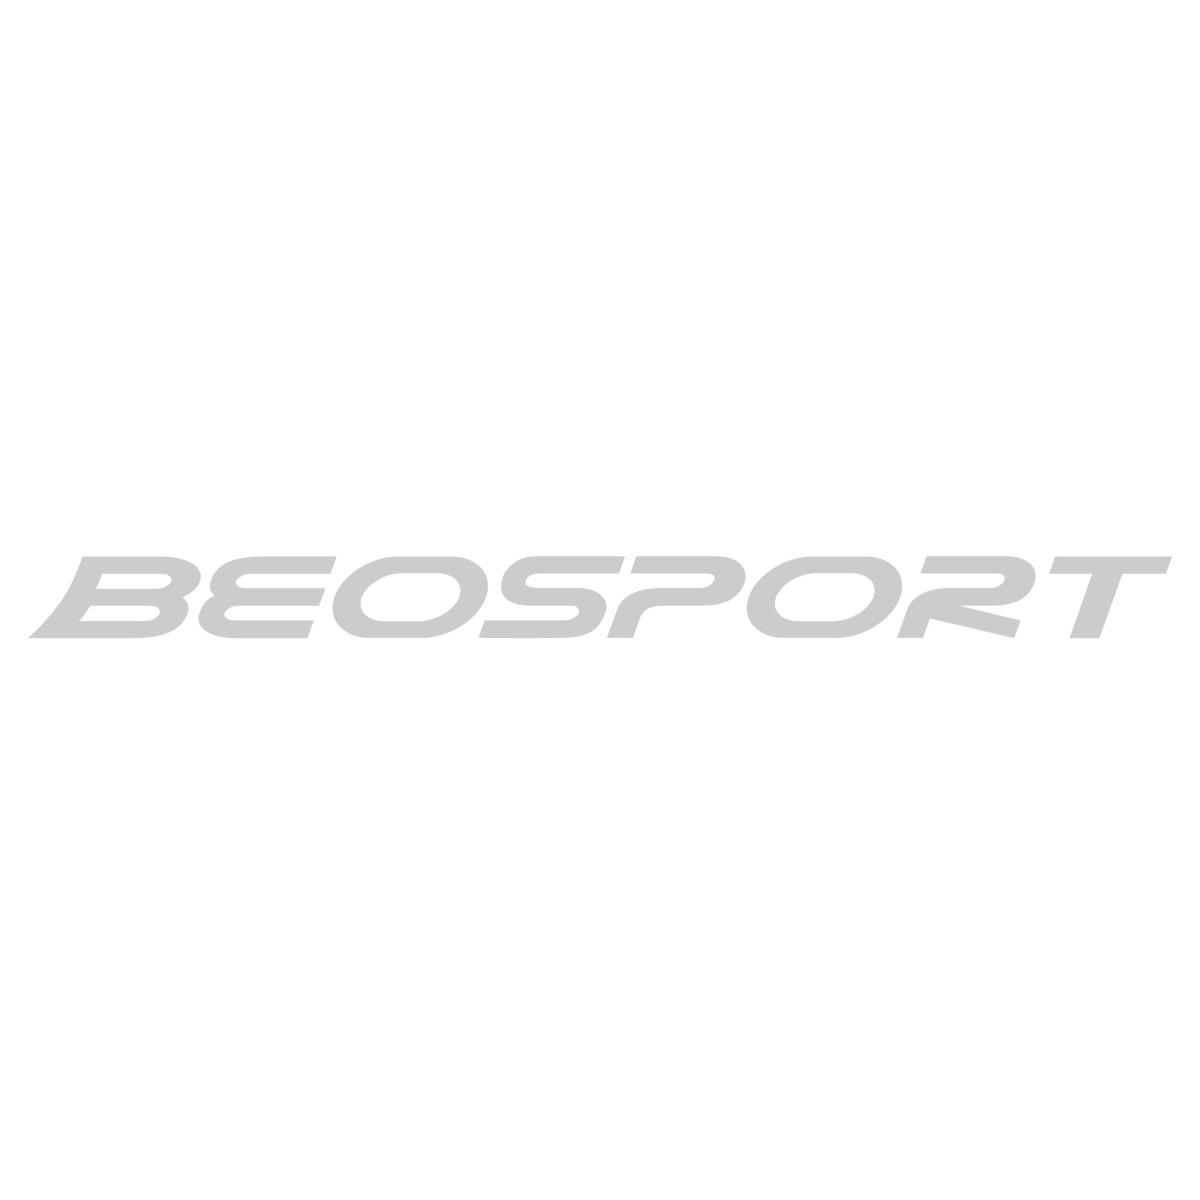 Garcia Men's džemper